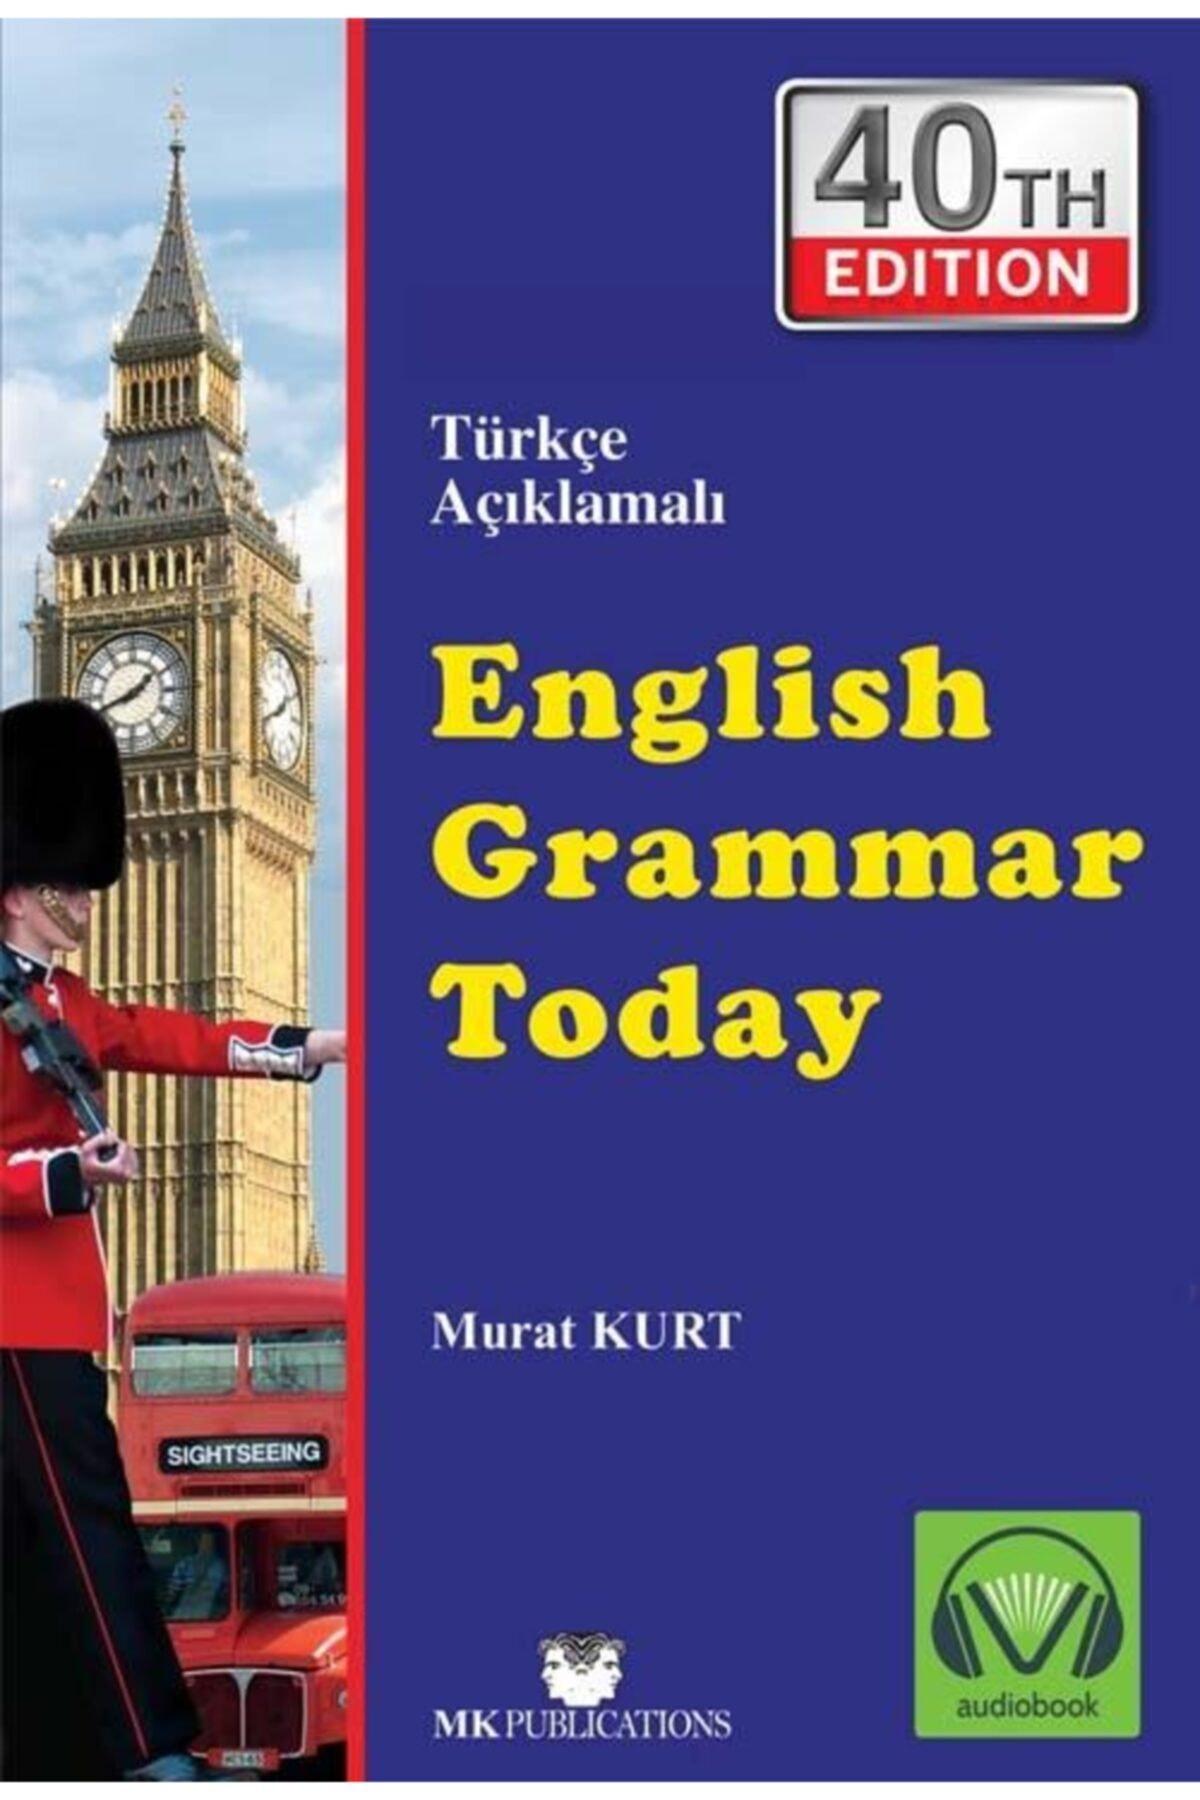 MK Publications English Grammar Today Murat Kurt 40. En Son Yeni Baskı 2